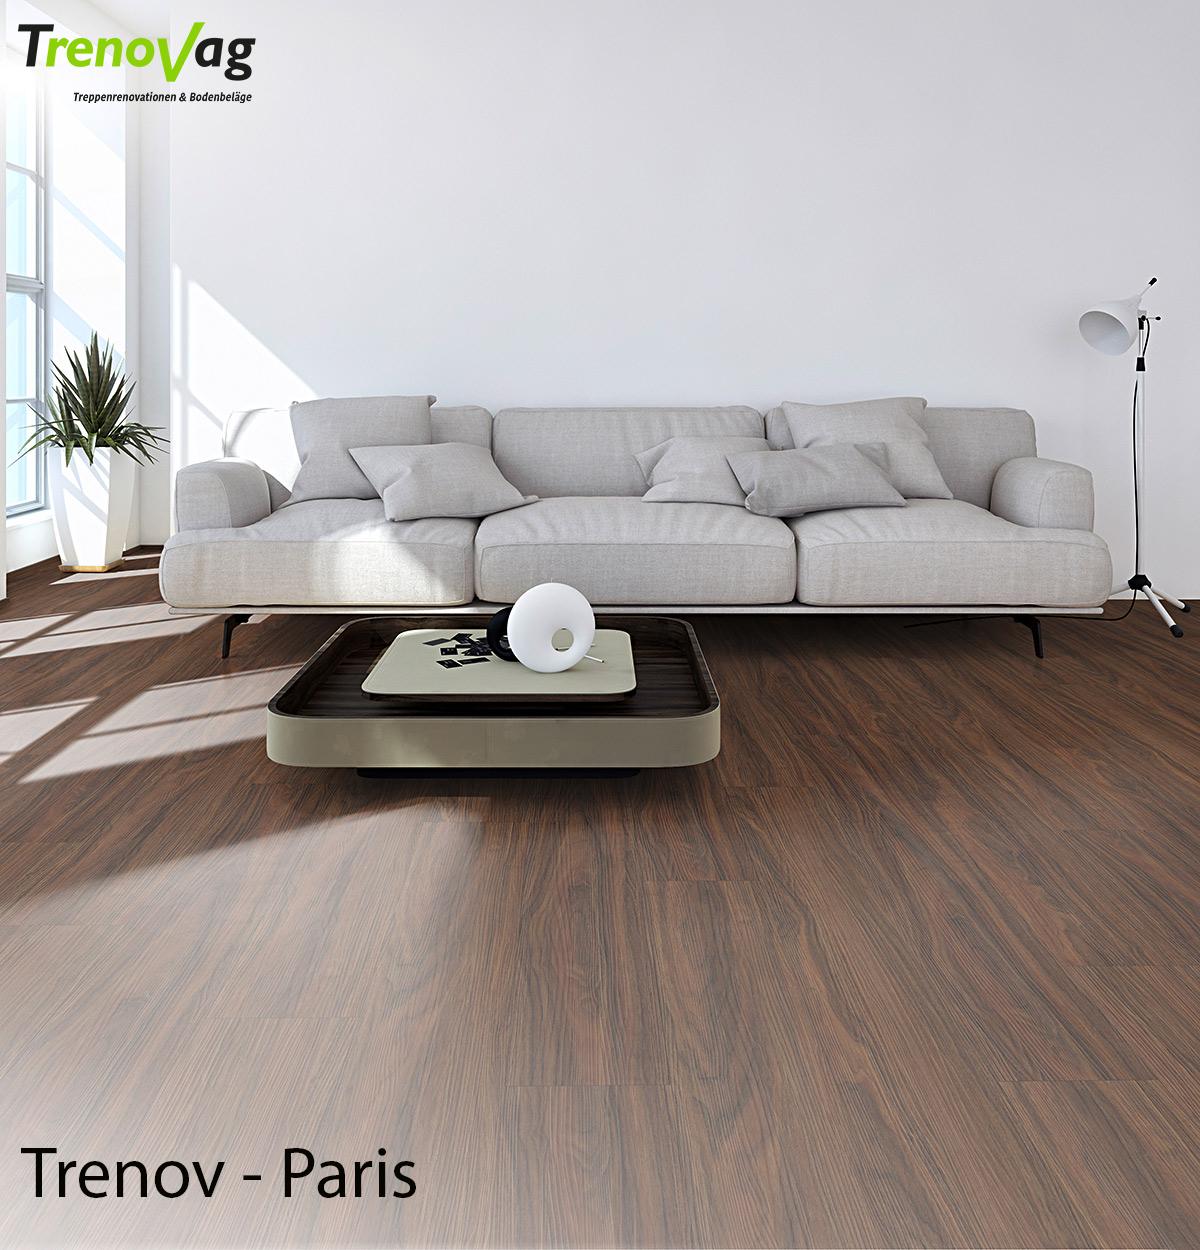 Trenov - Paris, Vinyl, Trenov-Vinyl, Designboden, Vinylboden, Vinyl verlegen, Vinylfussboden, Boden